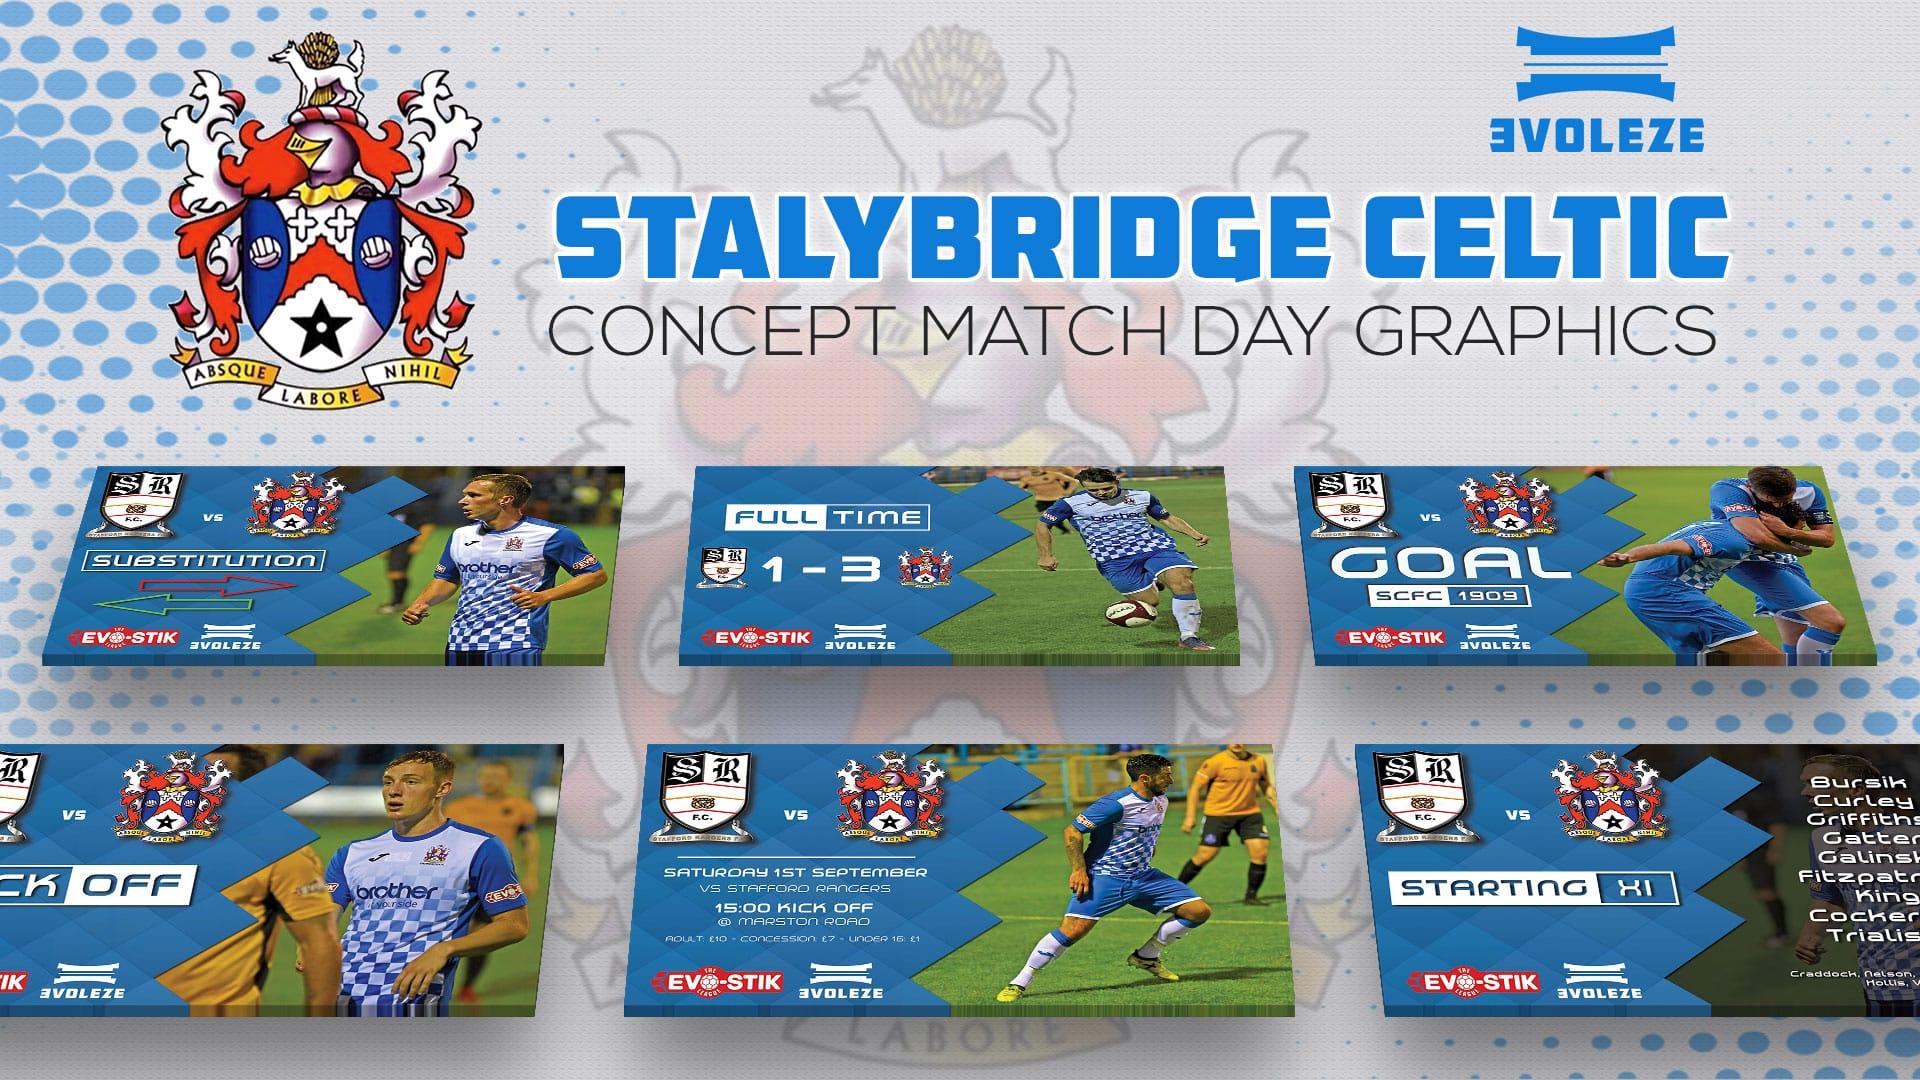 Stalybridge Celtic FC match day graphics